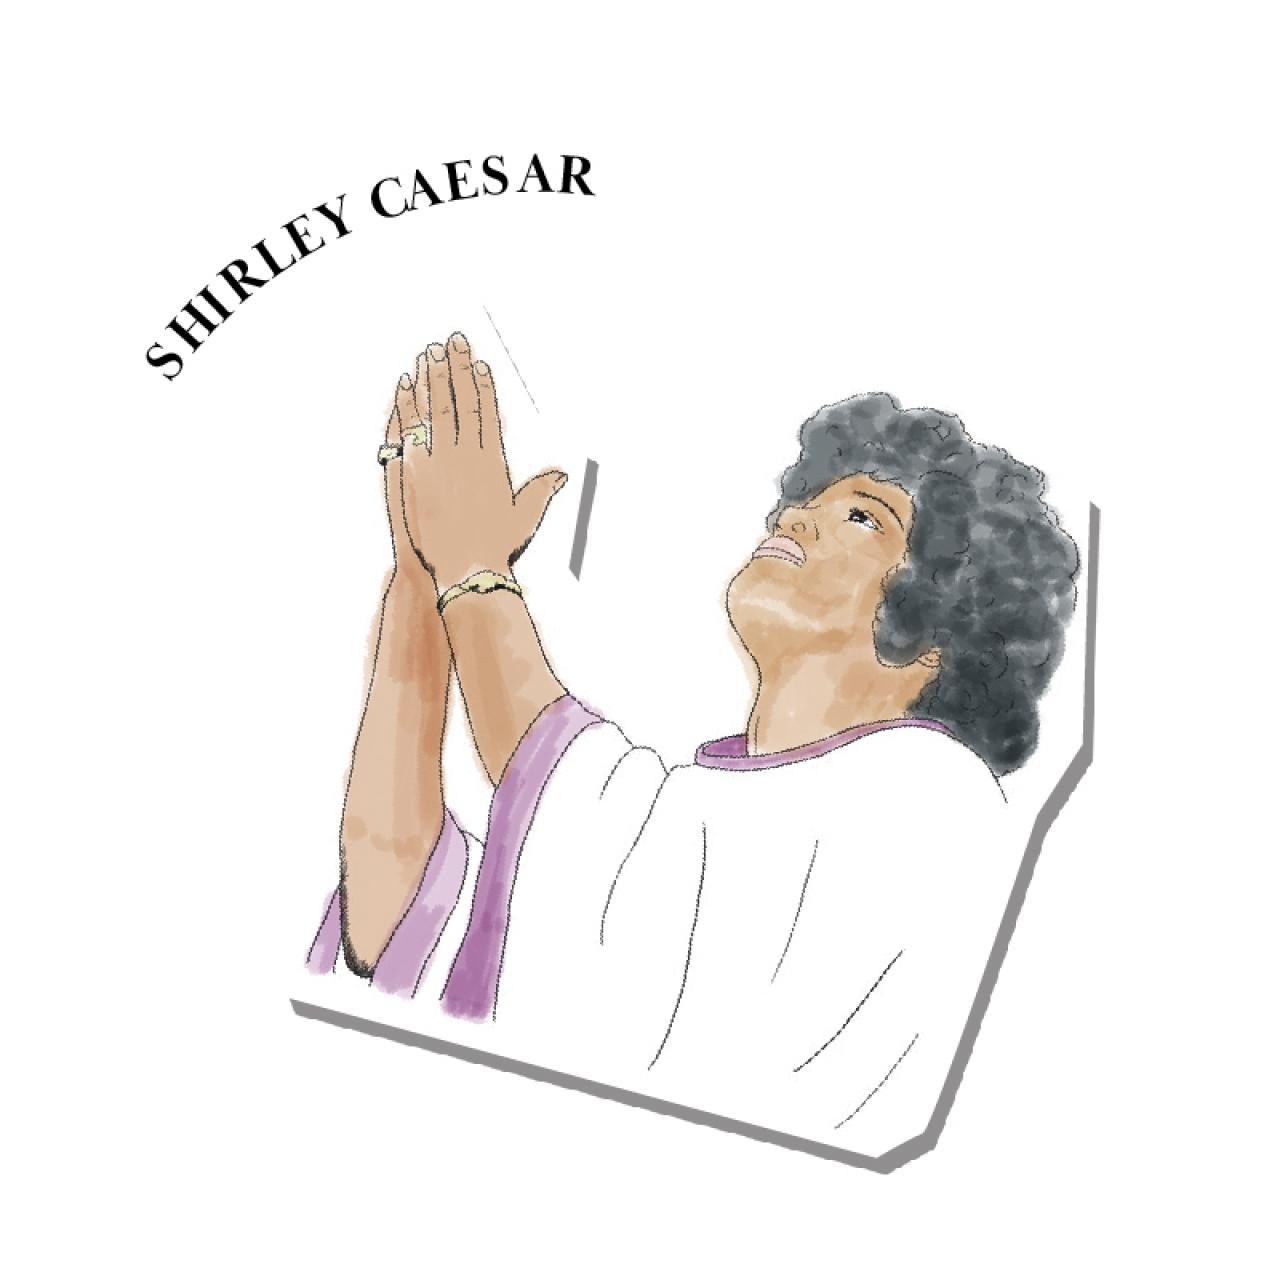 An illustration of Shirley Caesar